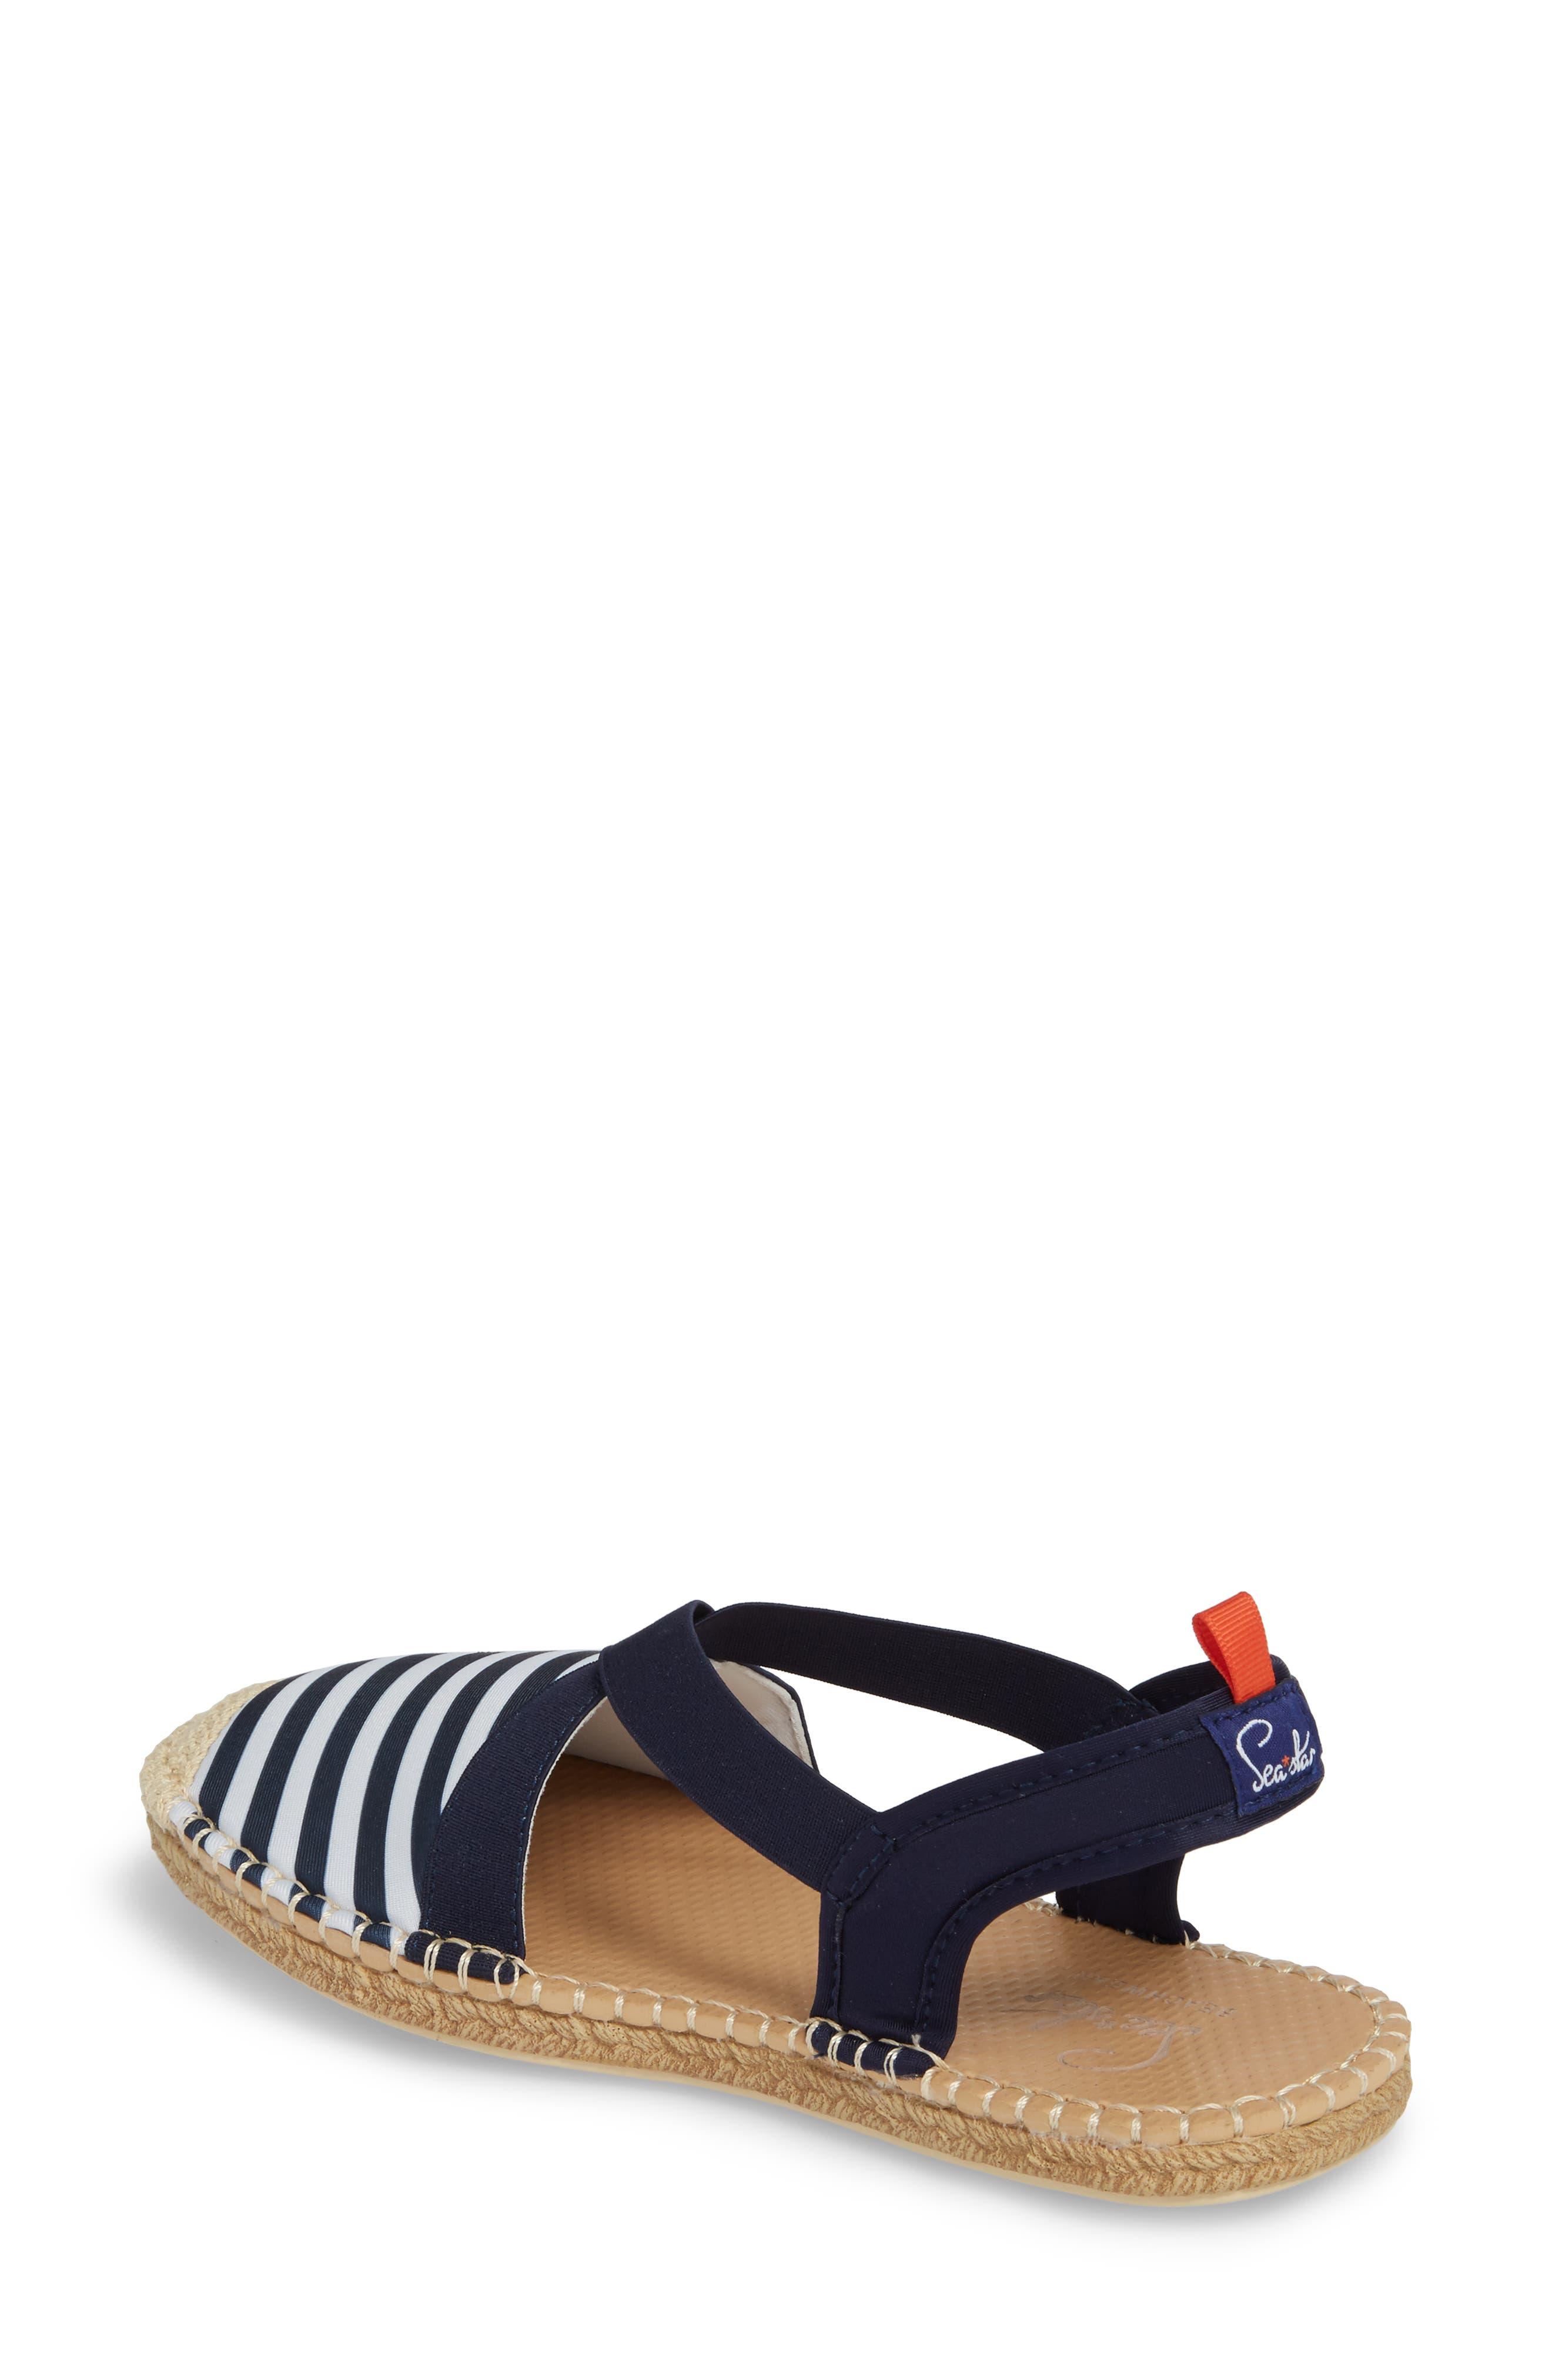 Sea Star Slingback Espadrille Water Shoe,                             Alternate thumbnail 2, color,                             Navy/ White Stripes